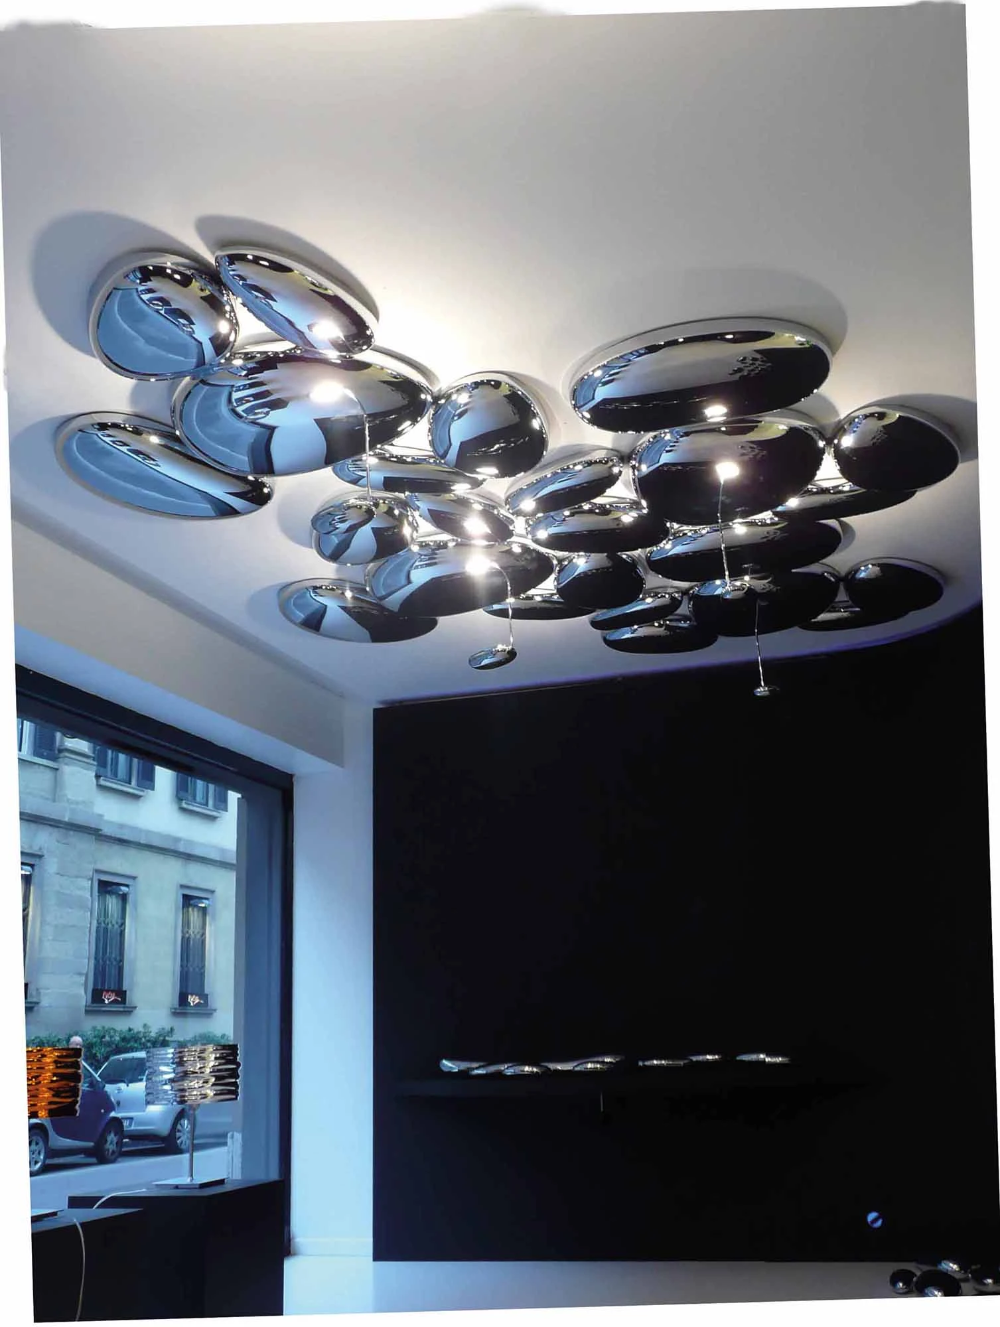 Skydro Ceiling Lamp Replica Mooielight Ceiling Lamp Ceiling Lights Led Ceiling Lights